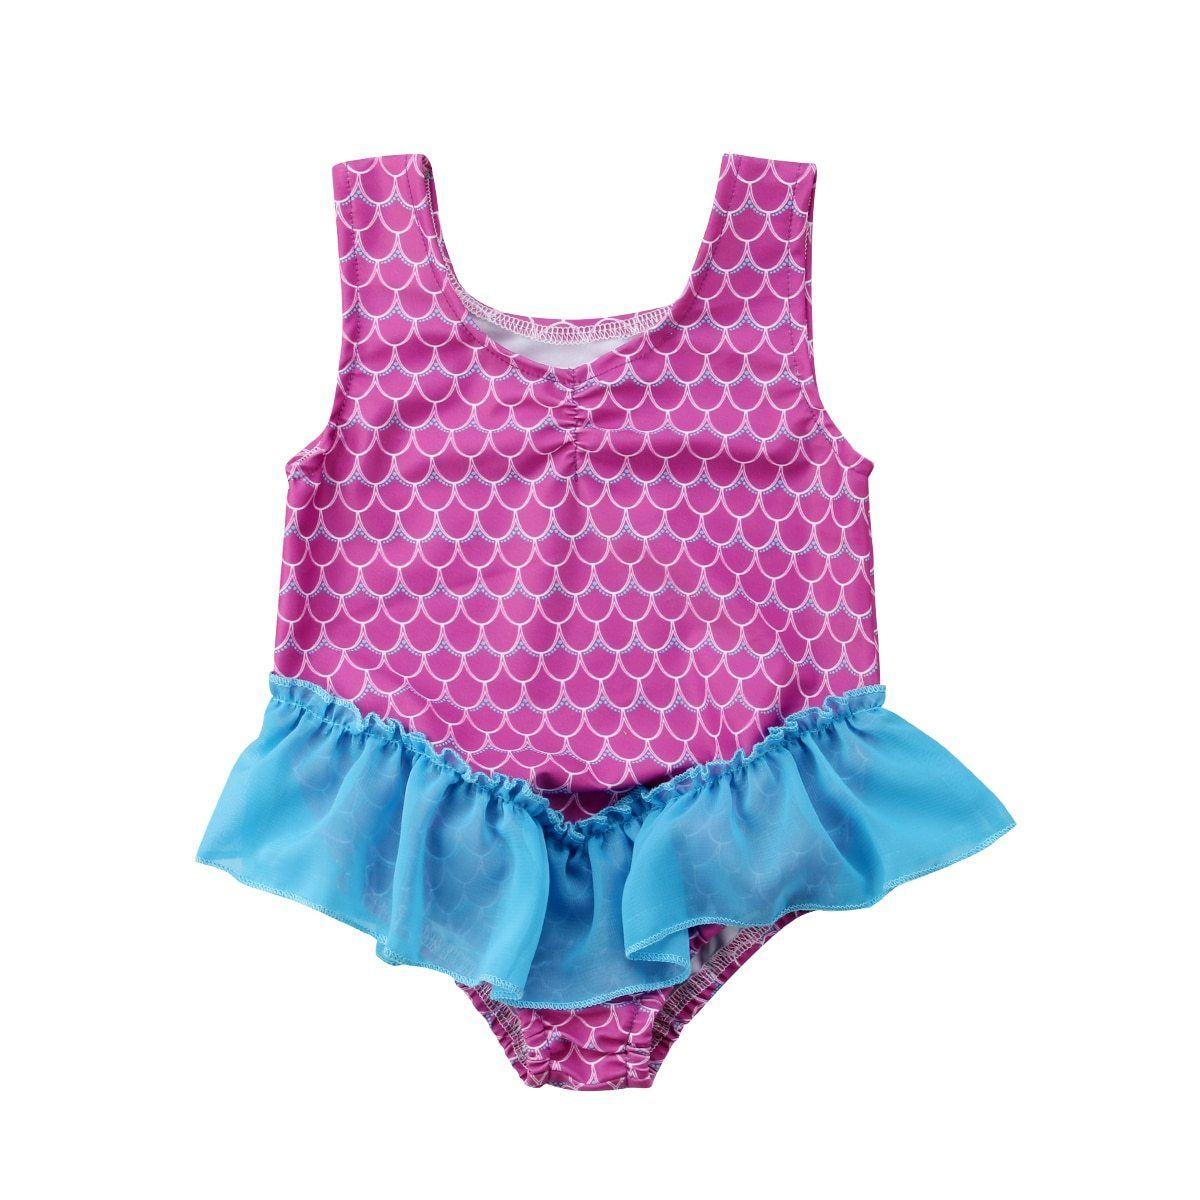 Infant Toddler Girls Summer Swimwear Bathing Suit for 6-24 Months Cartoon Print Tassel Bikini Beach Swimsuit Set